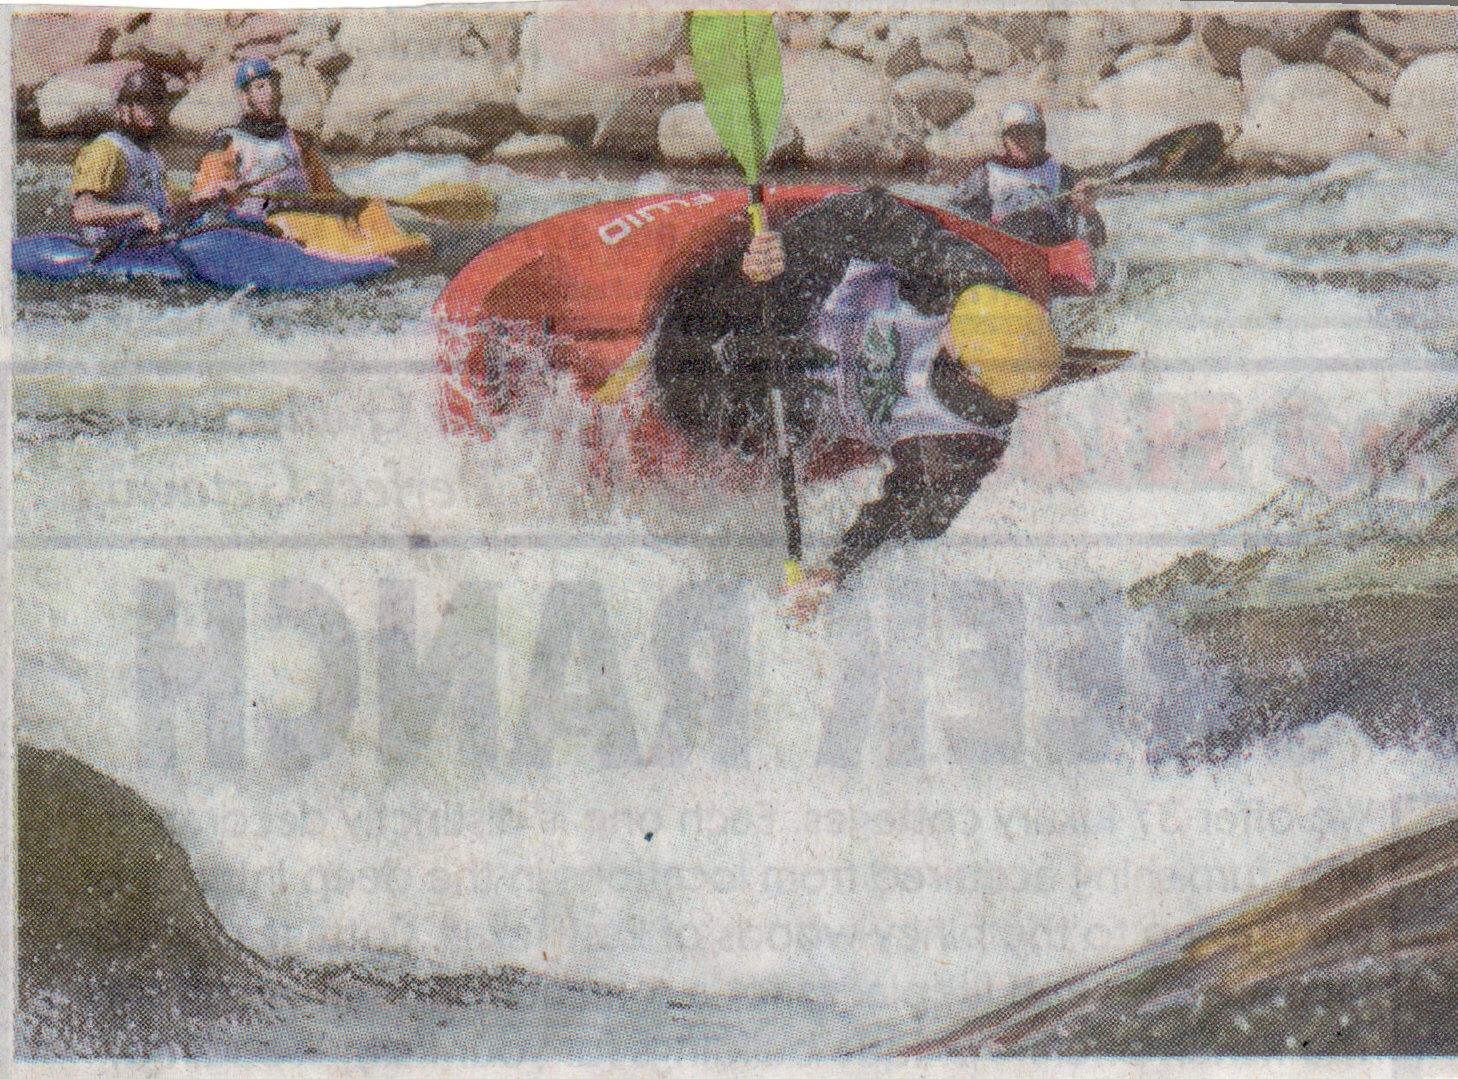 Click image for larger version  Name:Glenwoood kayaker.jpg Views:145 Size:741.6 KB ID:2038